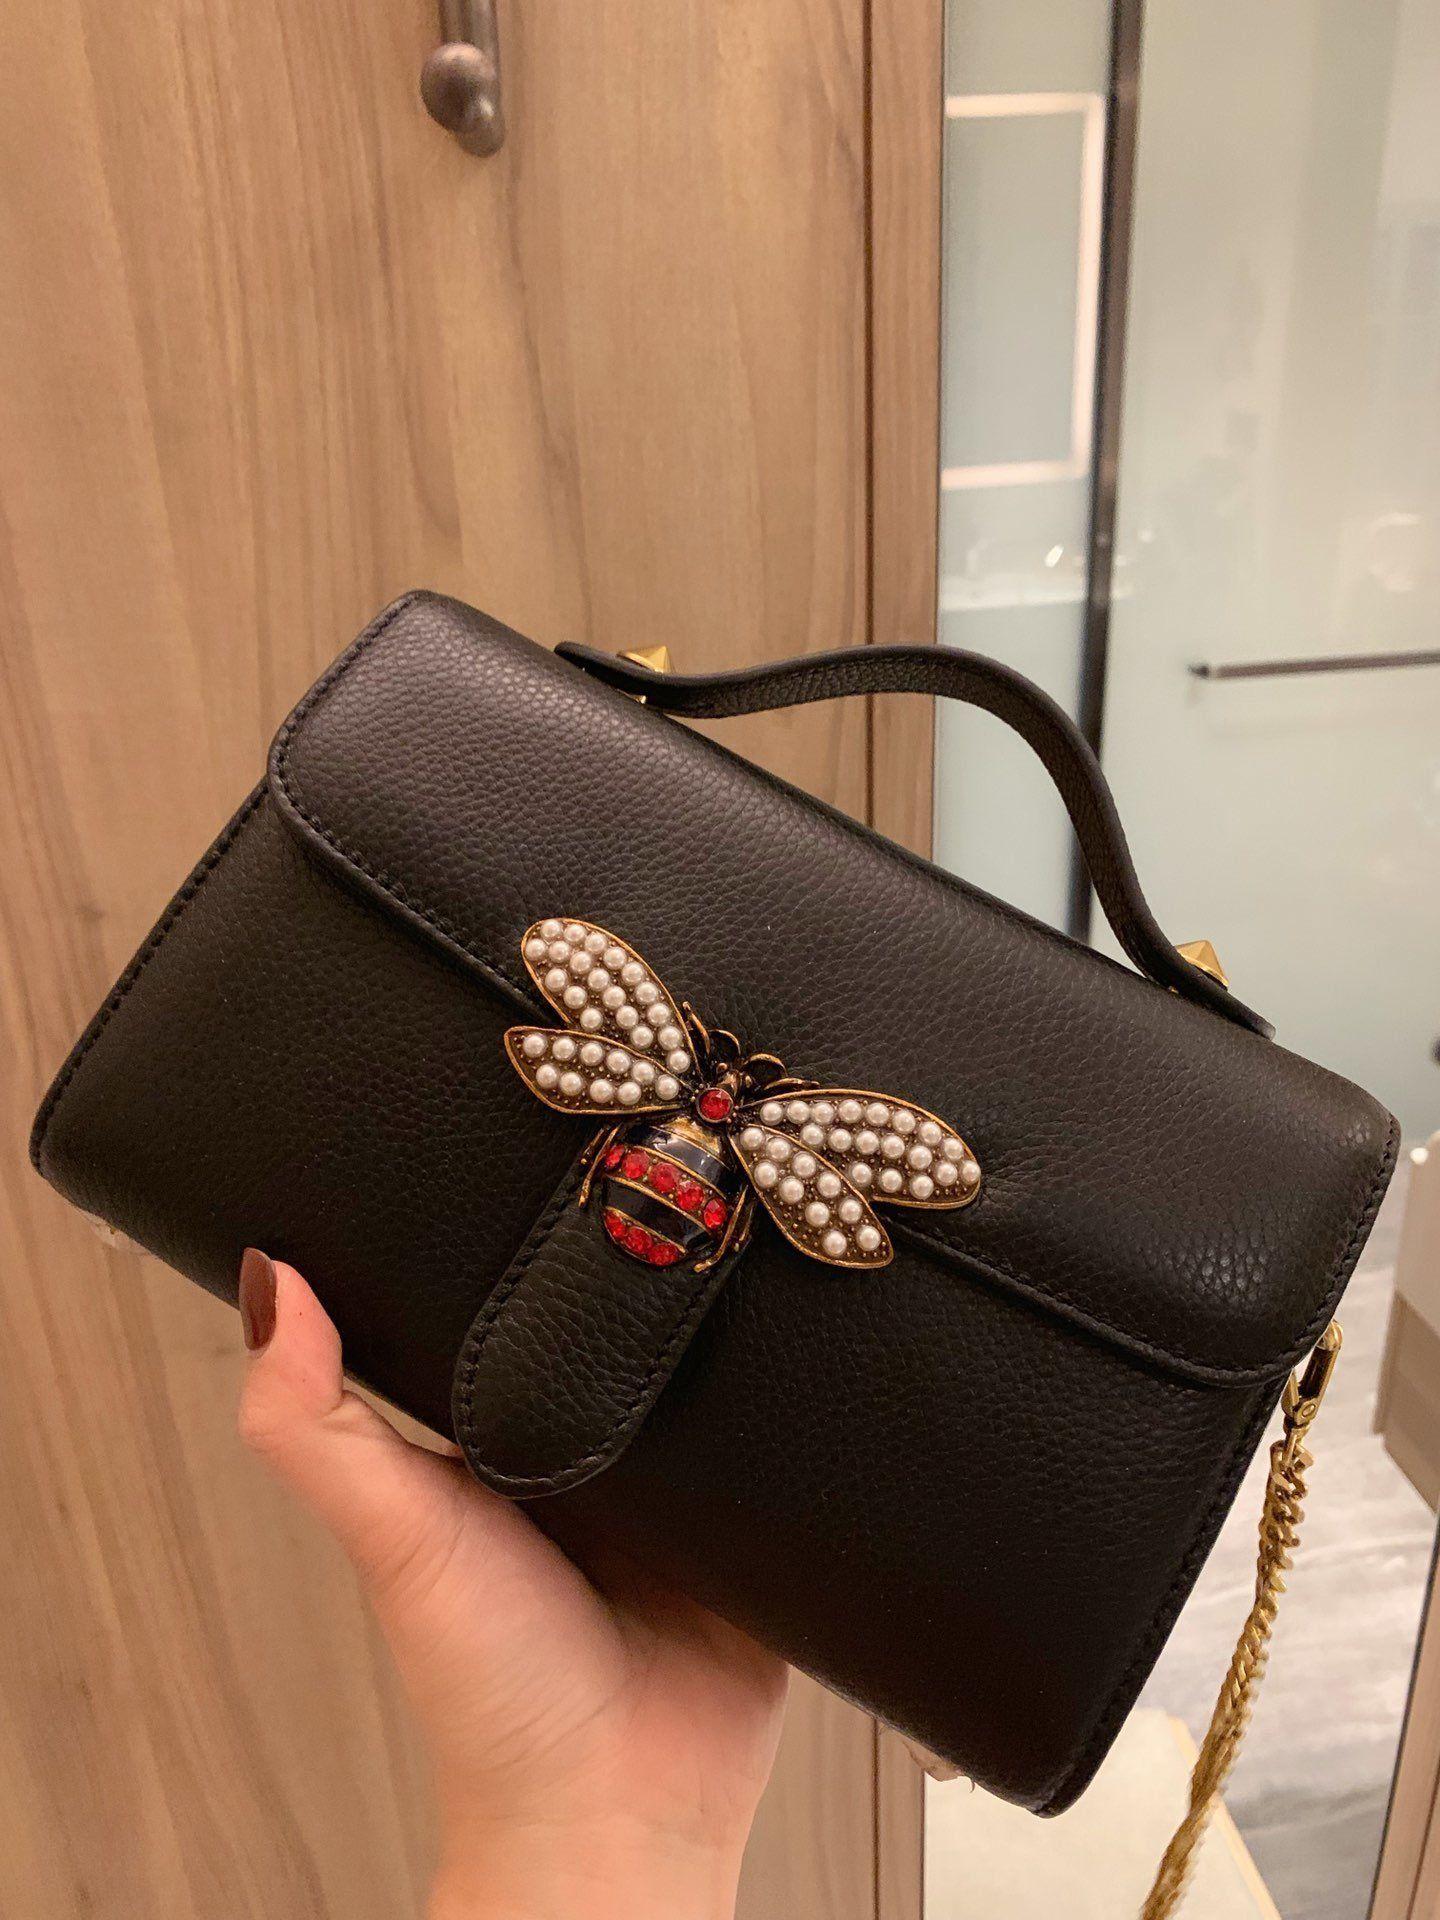 New fashion women's handbag fashion large capacity shoulder bag new handbag diagonal shoulder bag 121501